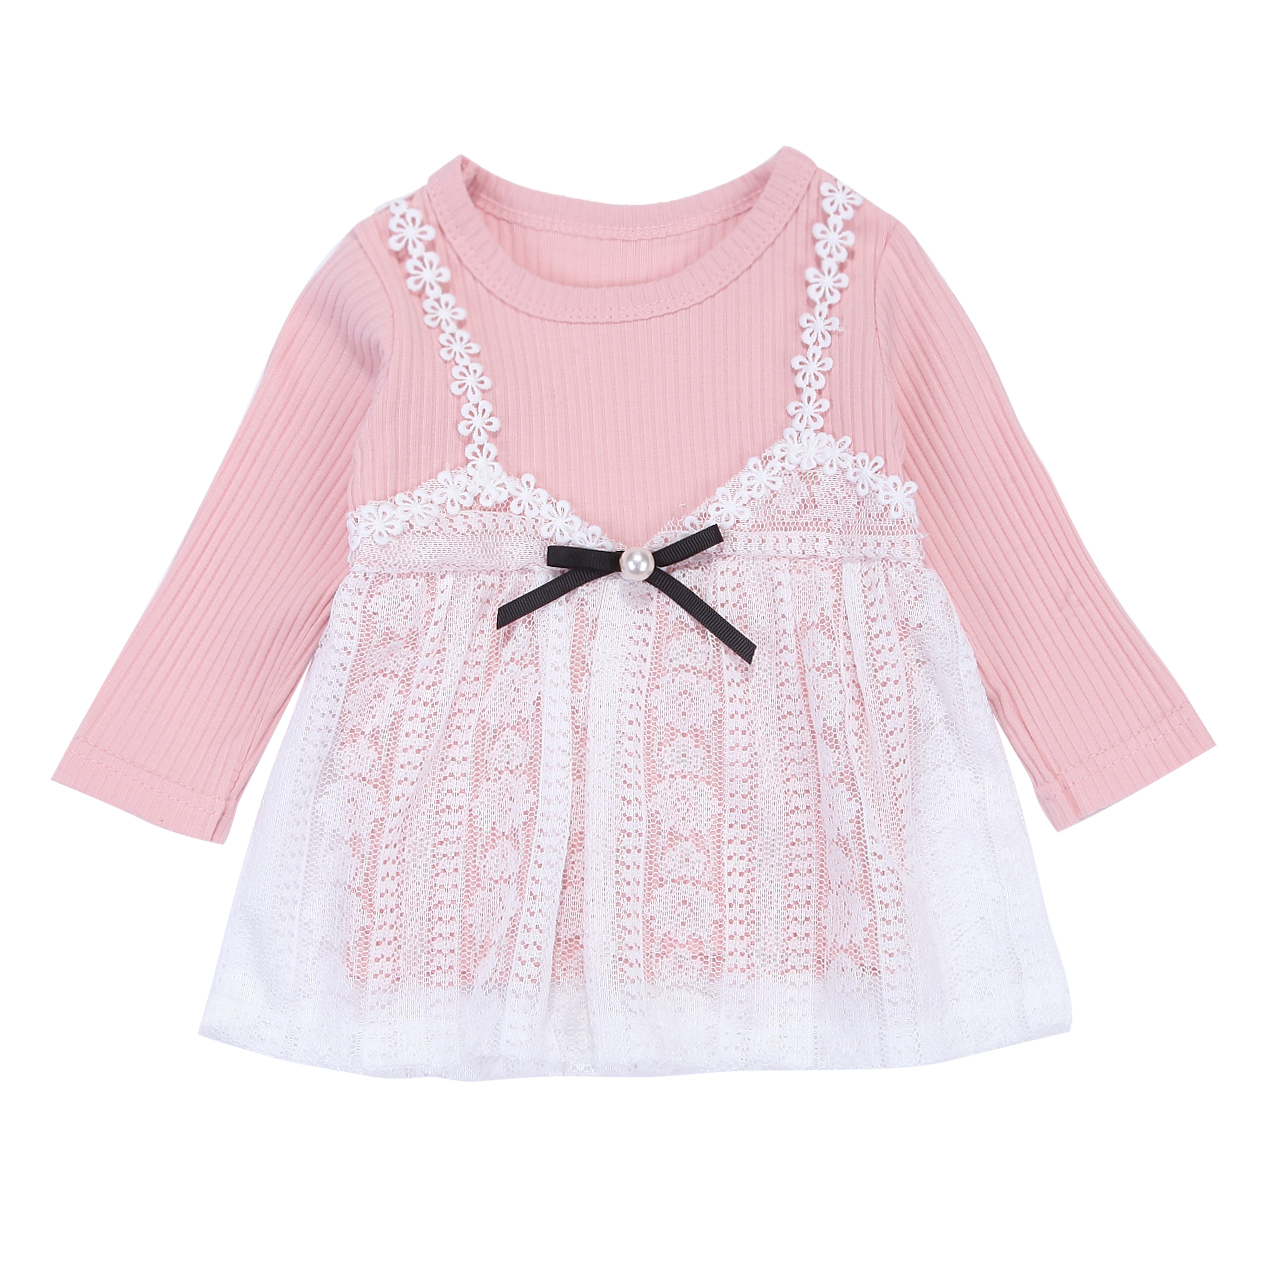 Newborn Kids Baby Girls Lace Floral Summer Clothes Mesh Tutu Tulle Mini Dress Princess Wedding Party Vestidos Dresses Sundress